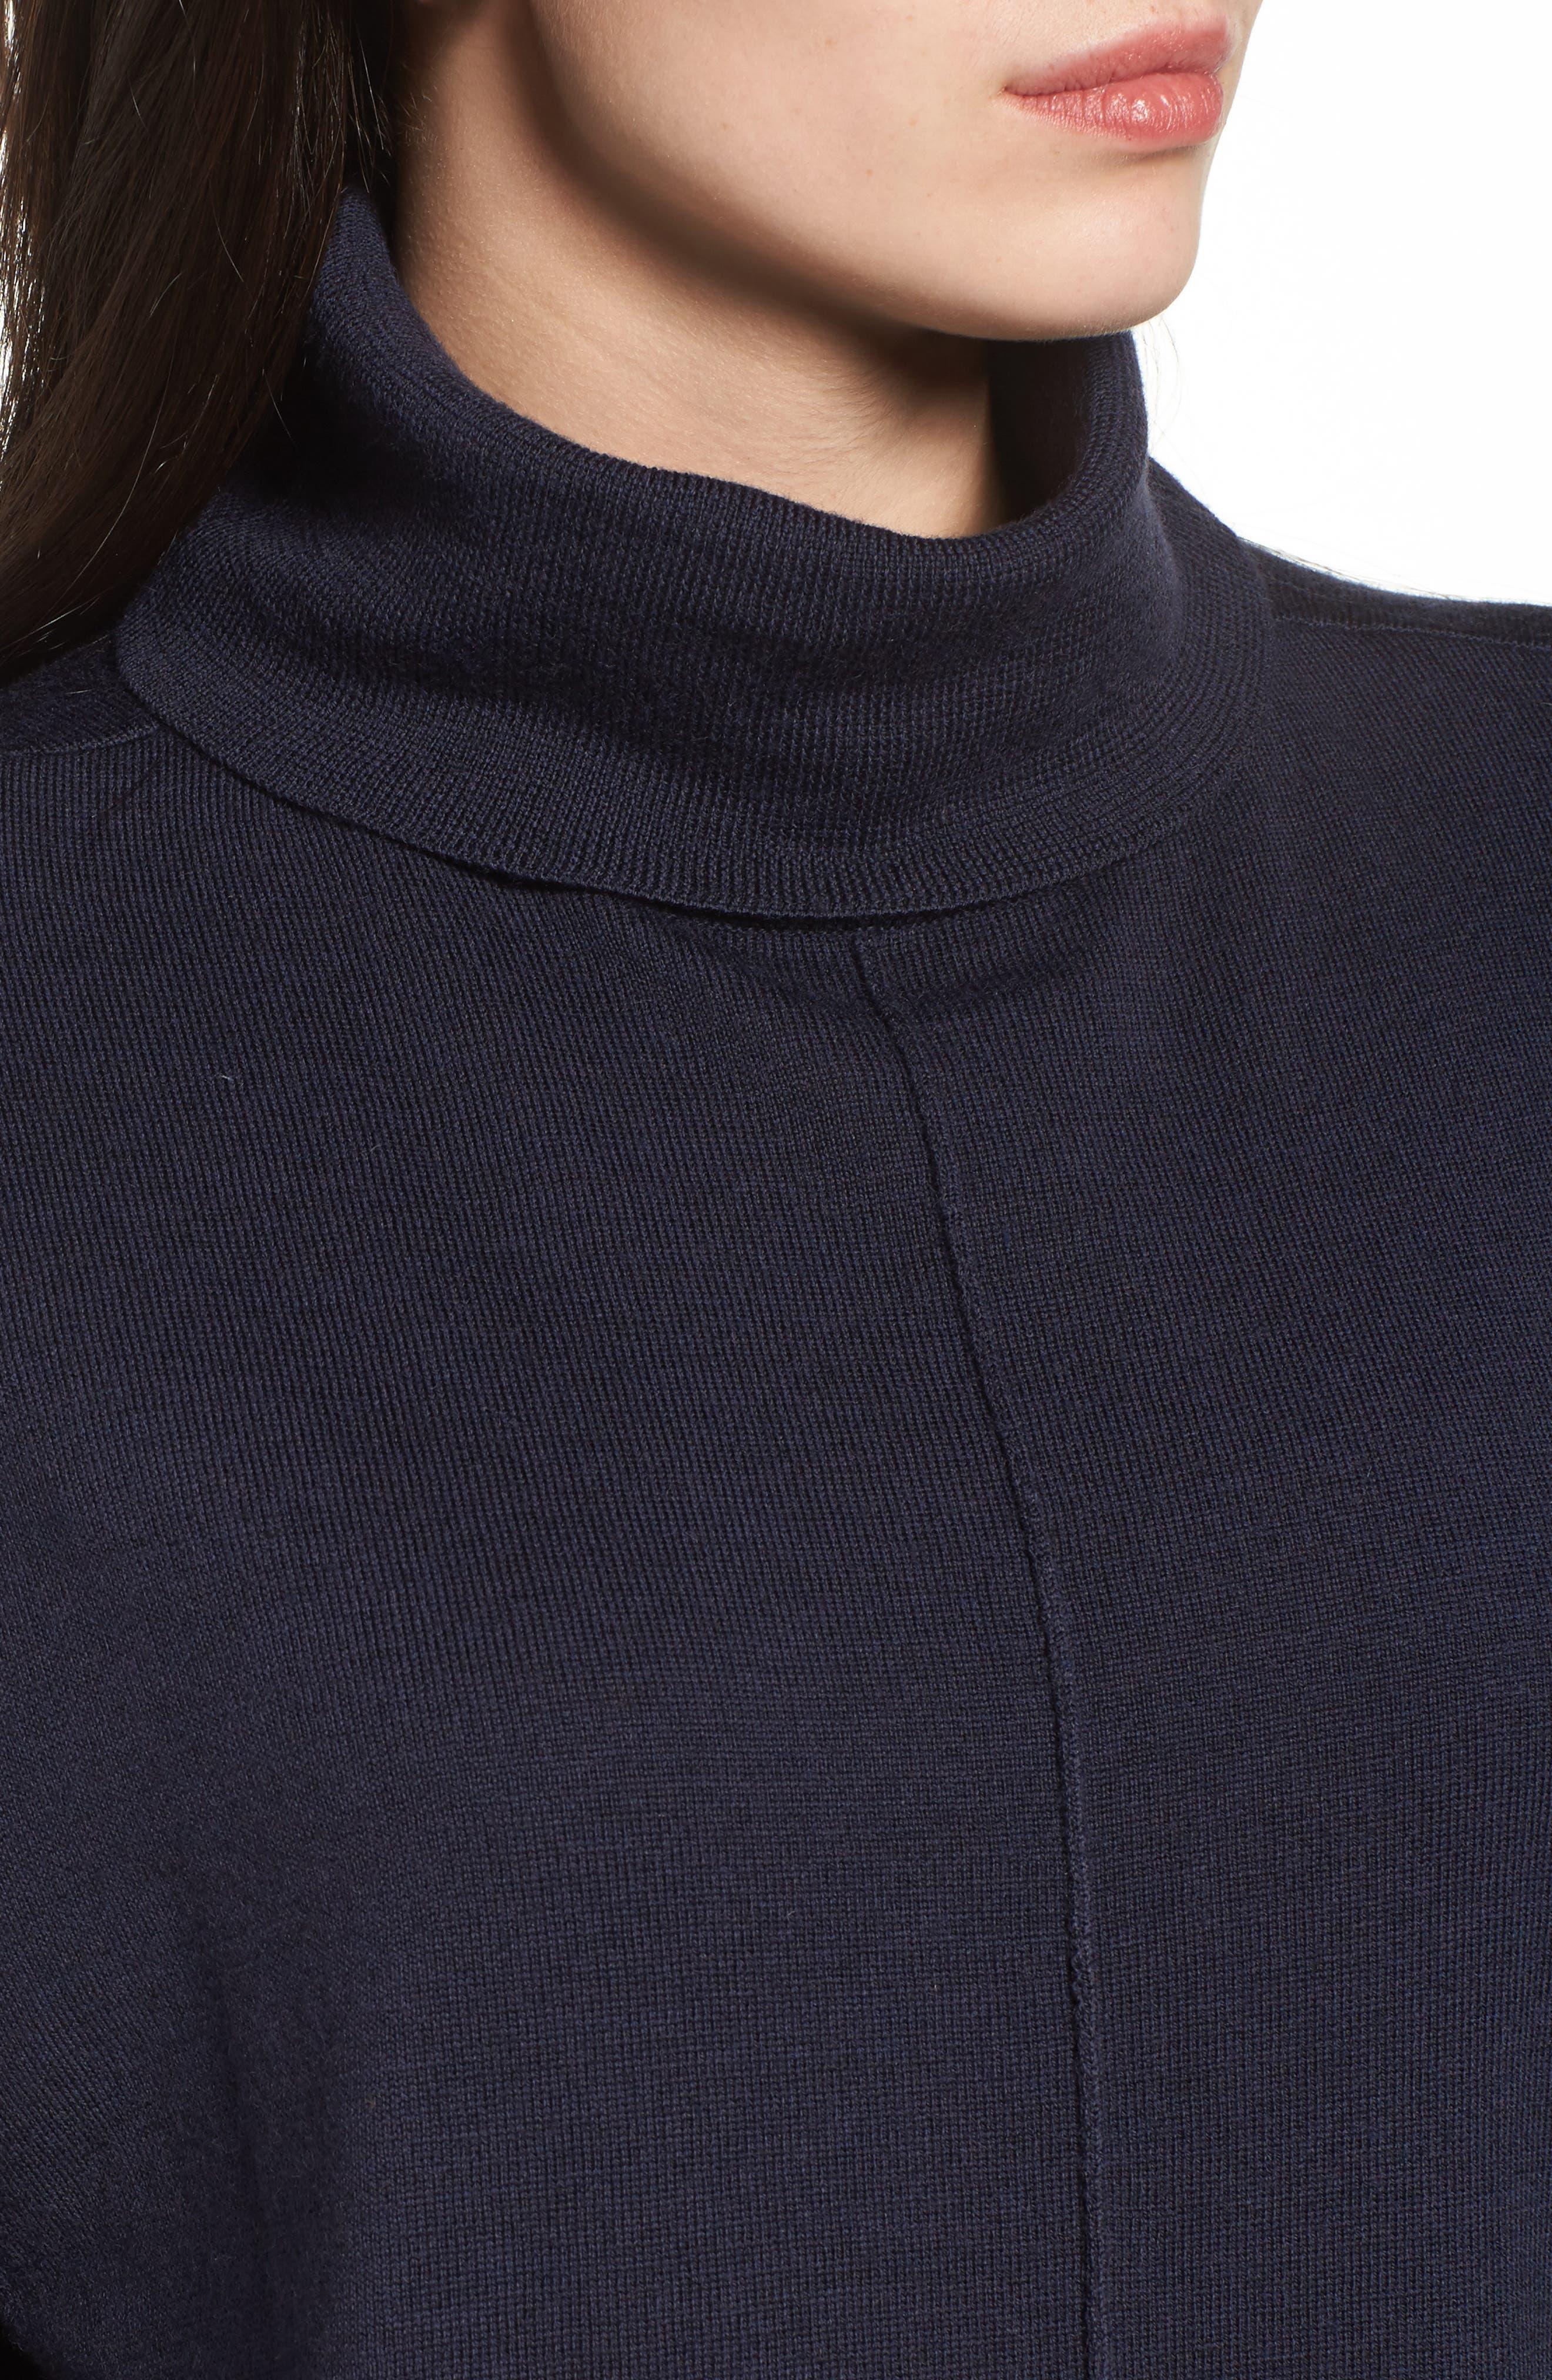 Merino Wool Boxy Turtleneck Sweater,                             Alternate thumbnail 21, color,